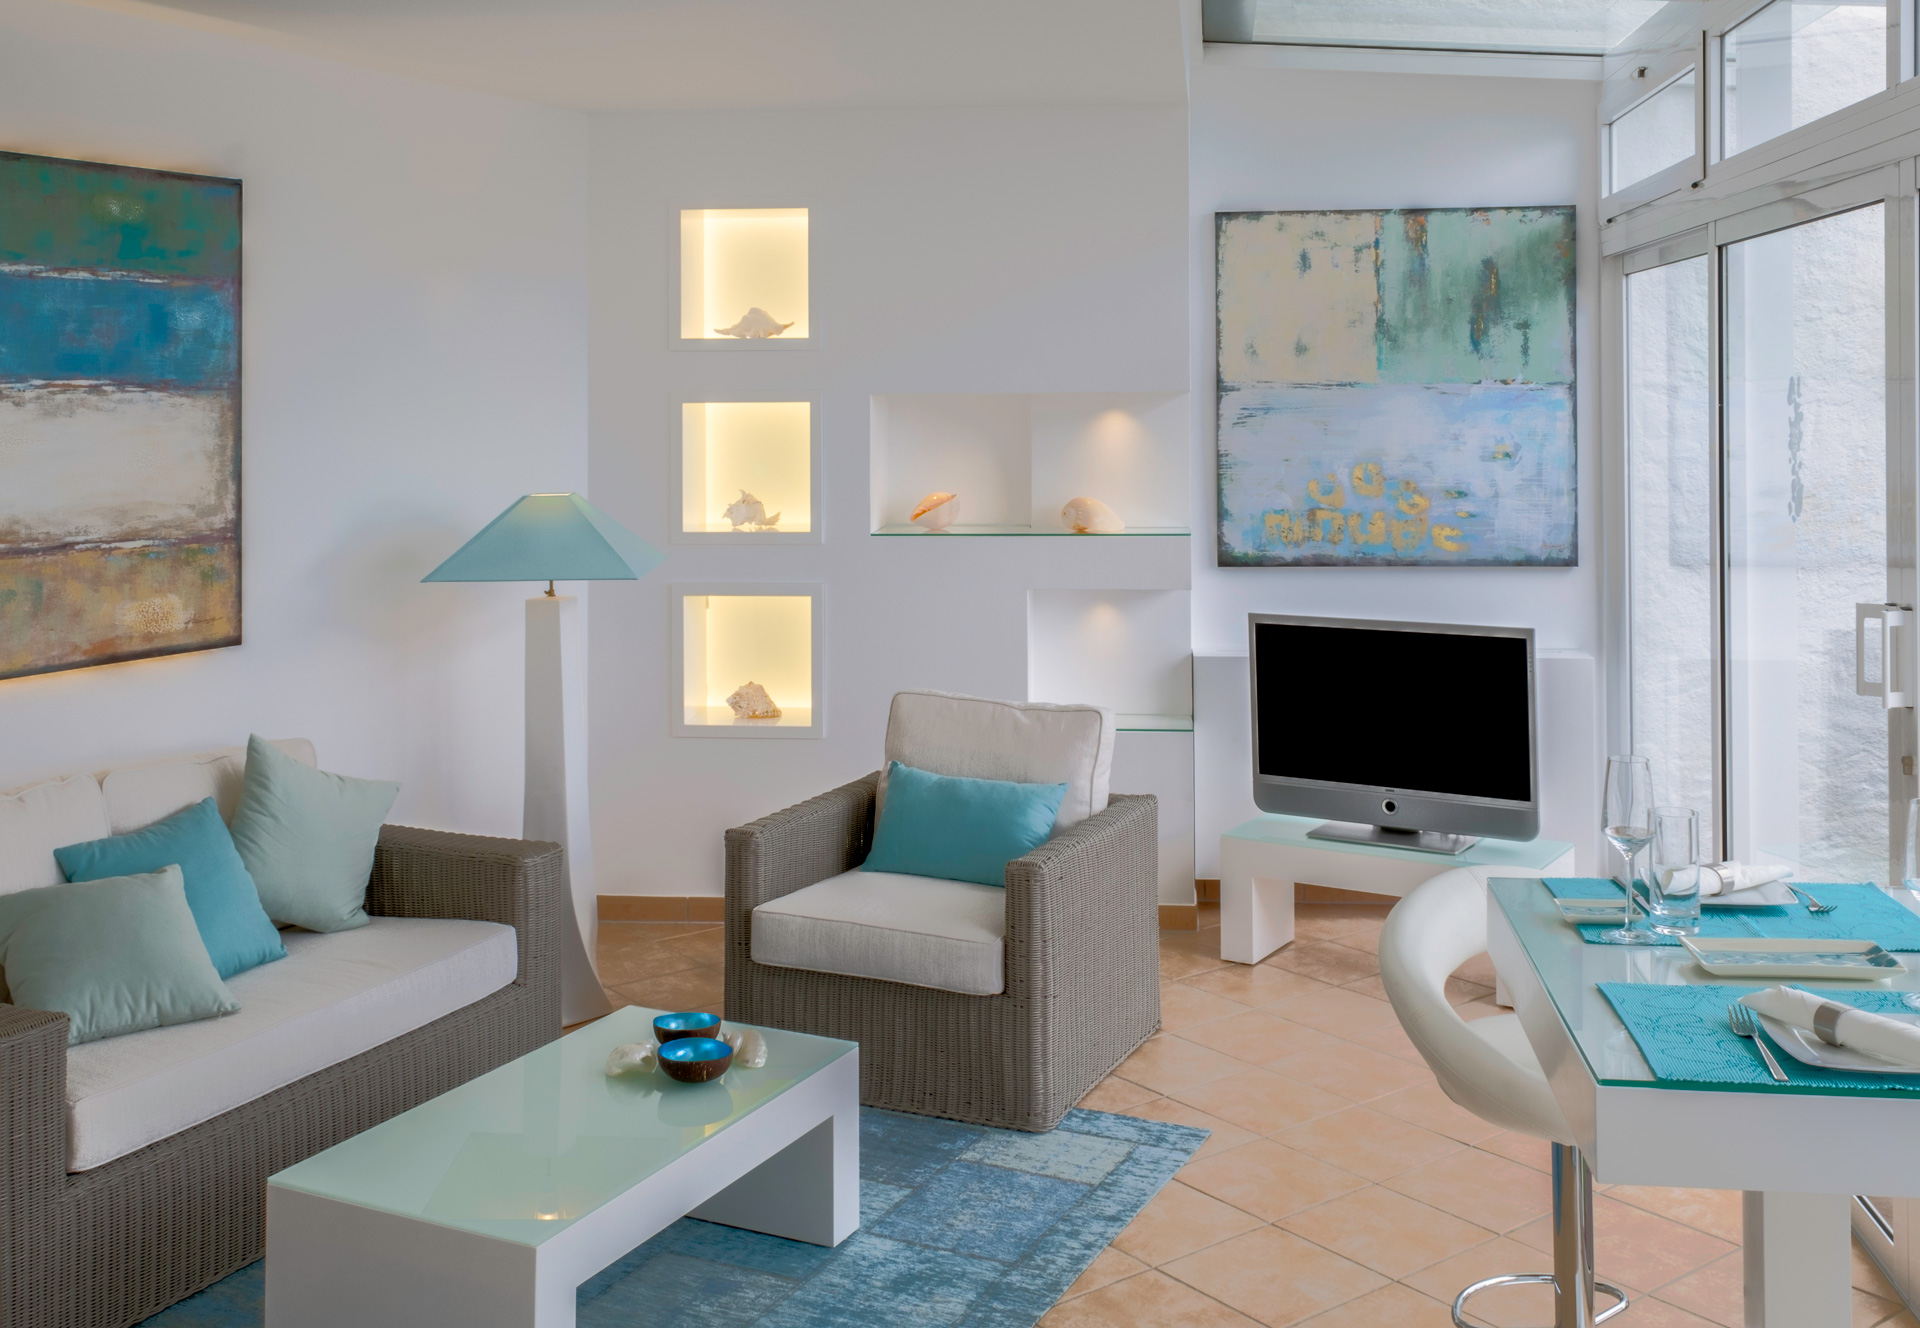 Casa San Marco at Jardin de la Paz: design apartment with ocean view